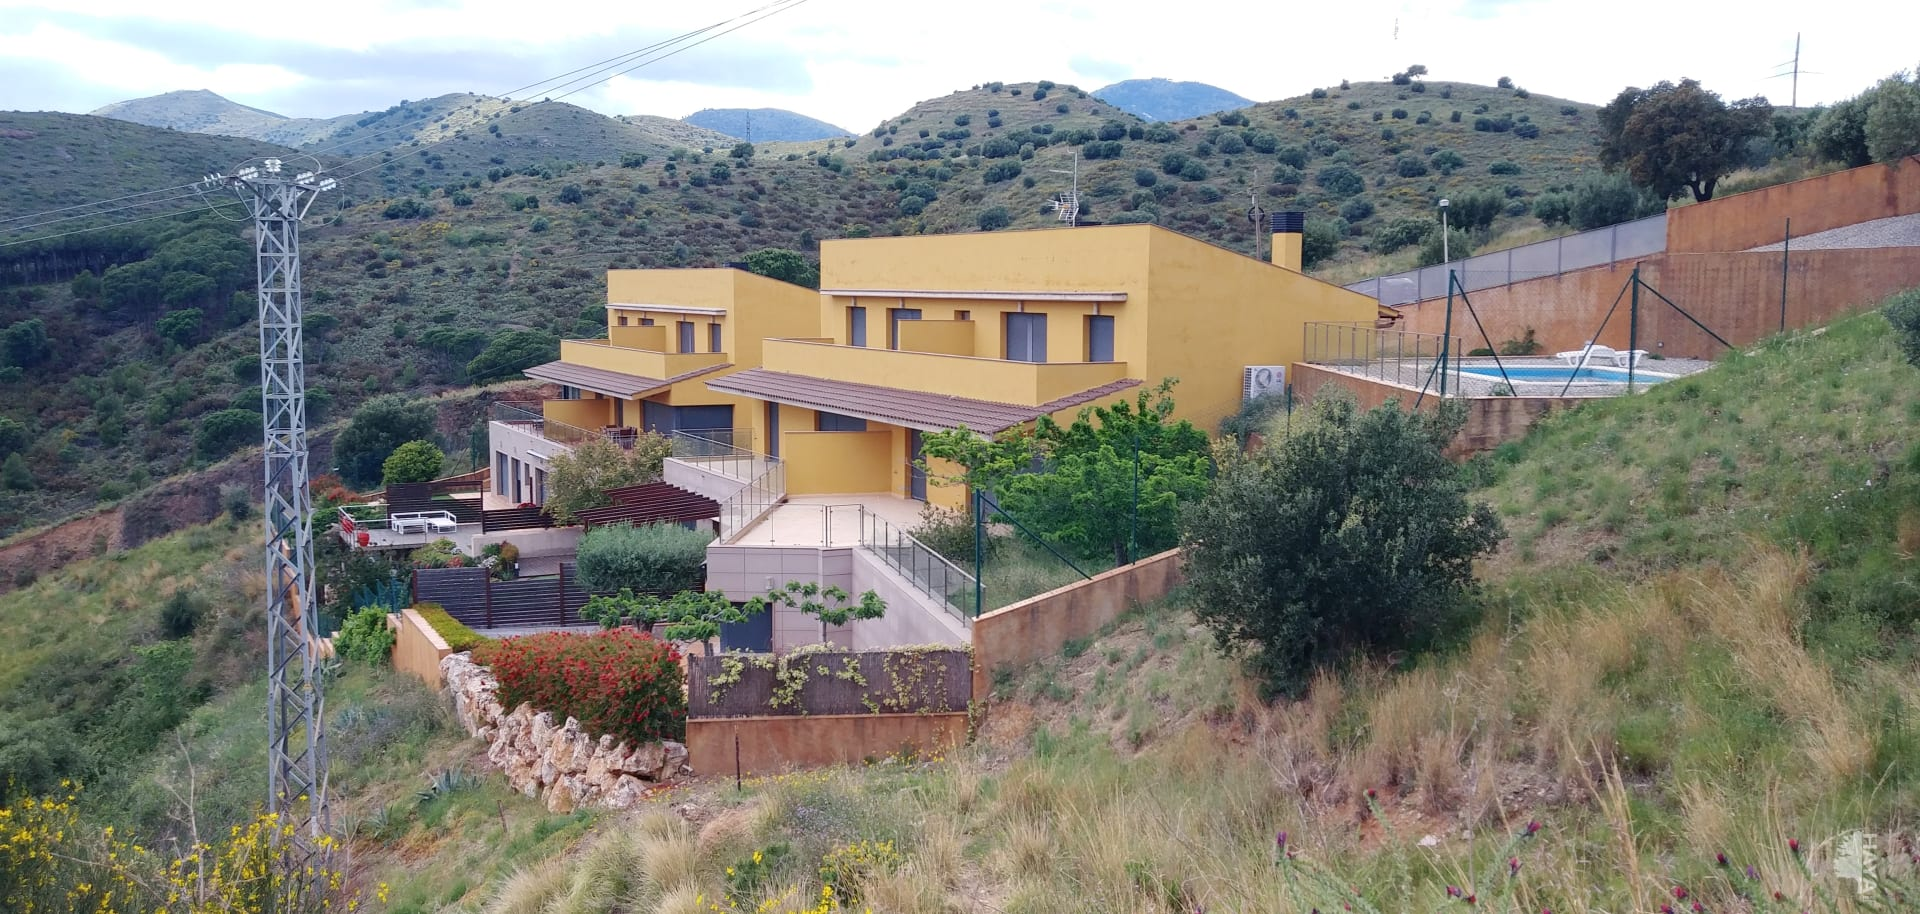 Piso en venta en Llançà, Llançà, Girona, Calle Castello, 279.000 €, 4 habitaciones, 3 baños, 138 m2